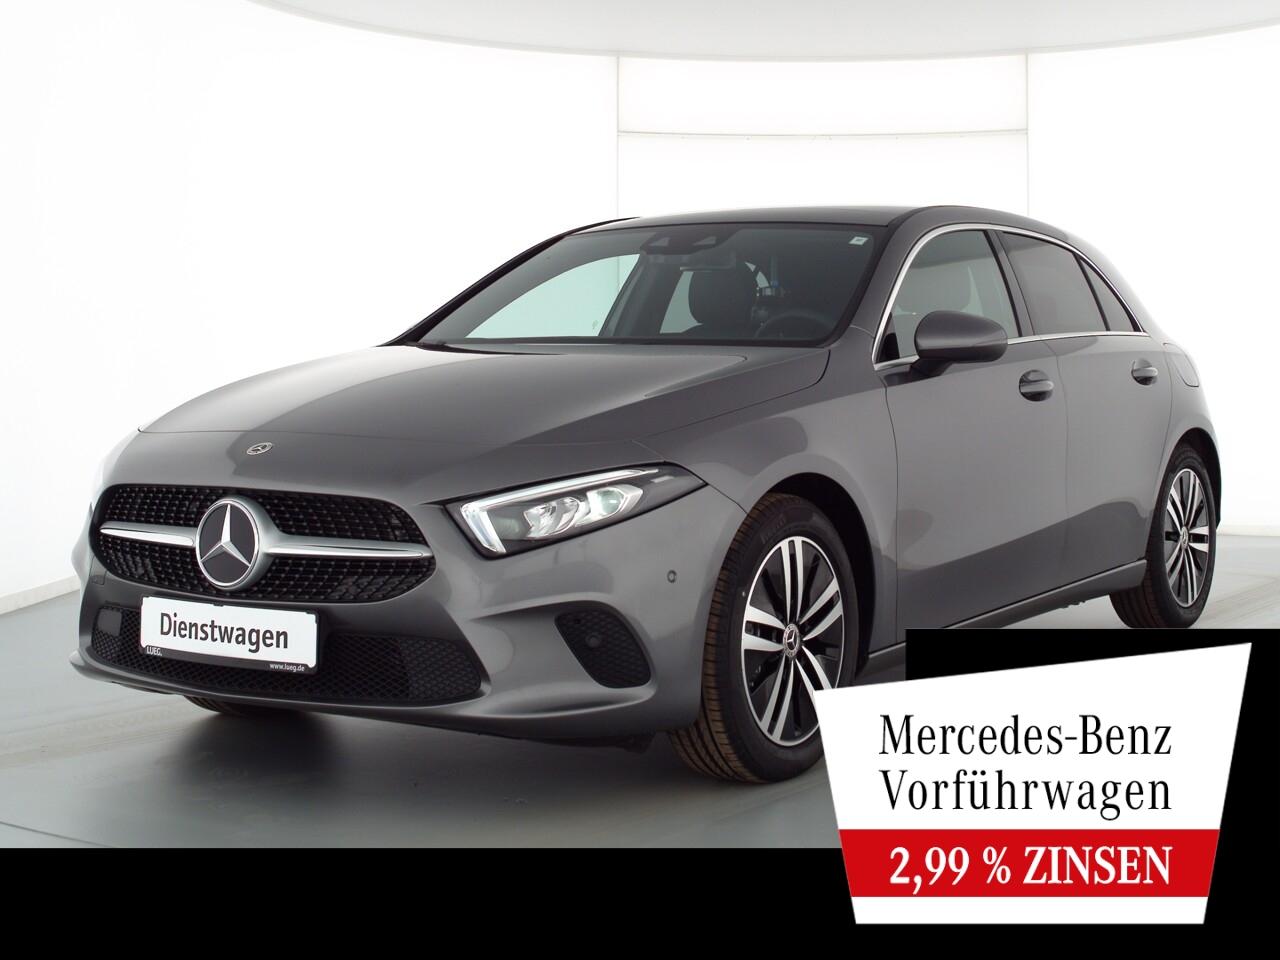 Mercedes-Benz A 180 PROGRESSIVE+PANO+AHK+TOTW+MBUX-HIGH+KAMERA, Jahr 2021, Benzin